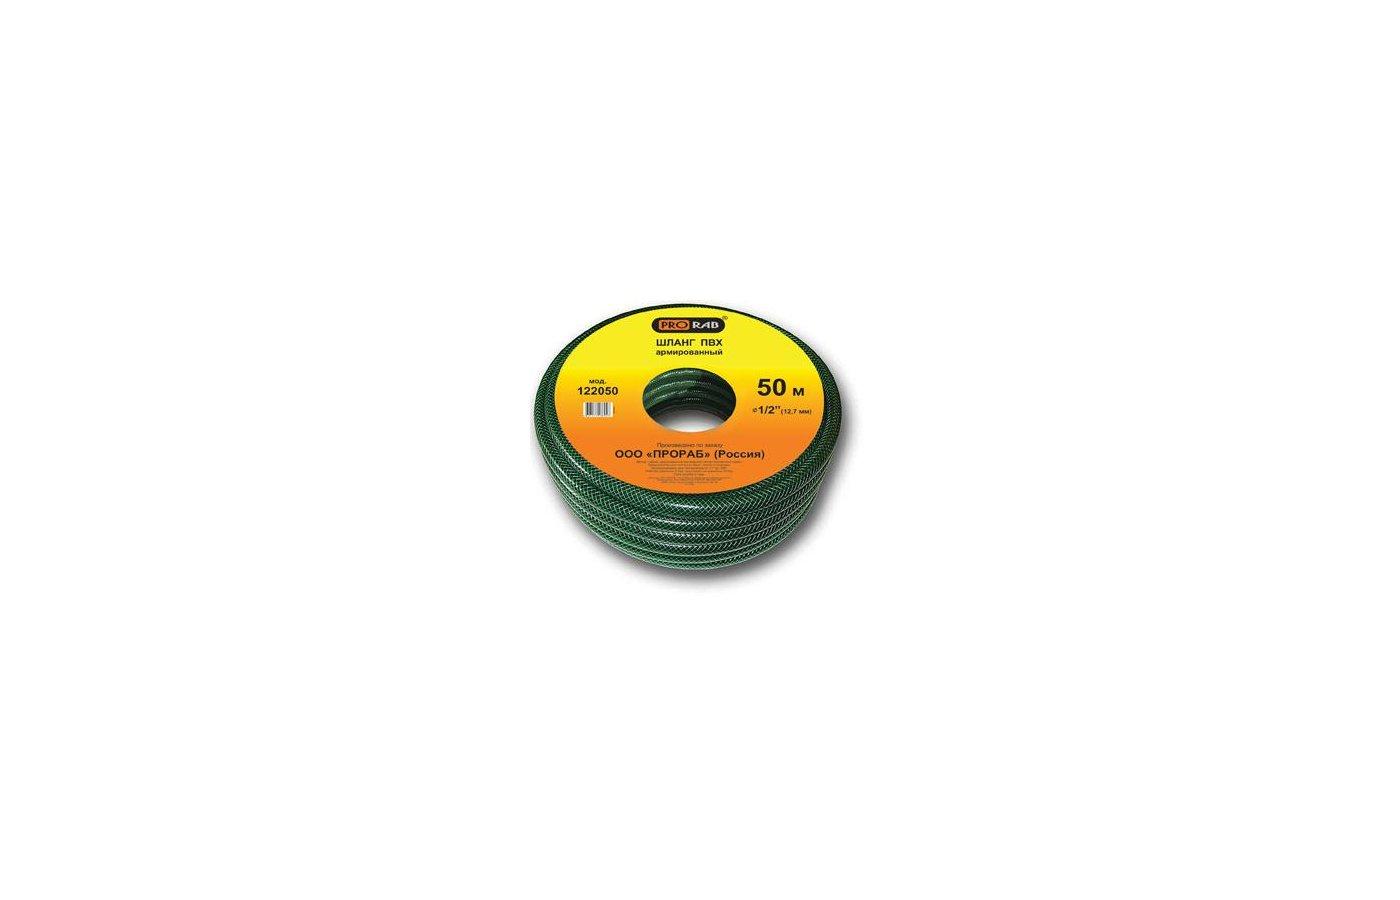 "Поливочное оборудование Prorab 122050   Шланг ПВХ для полива, диаметр 1/2"", 50 м  Hobby"